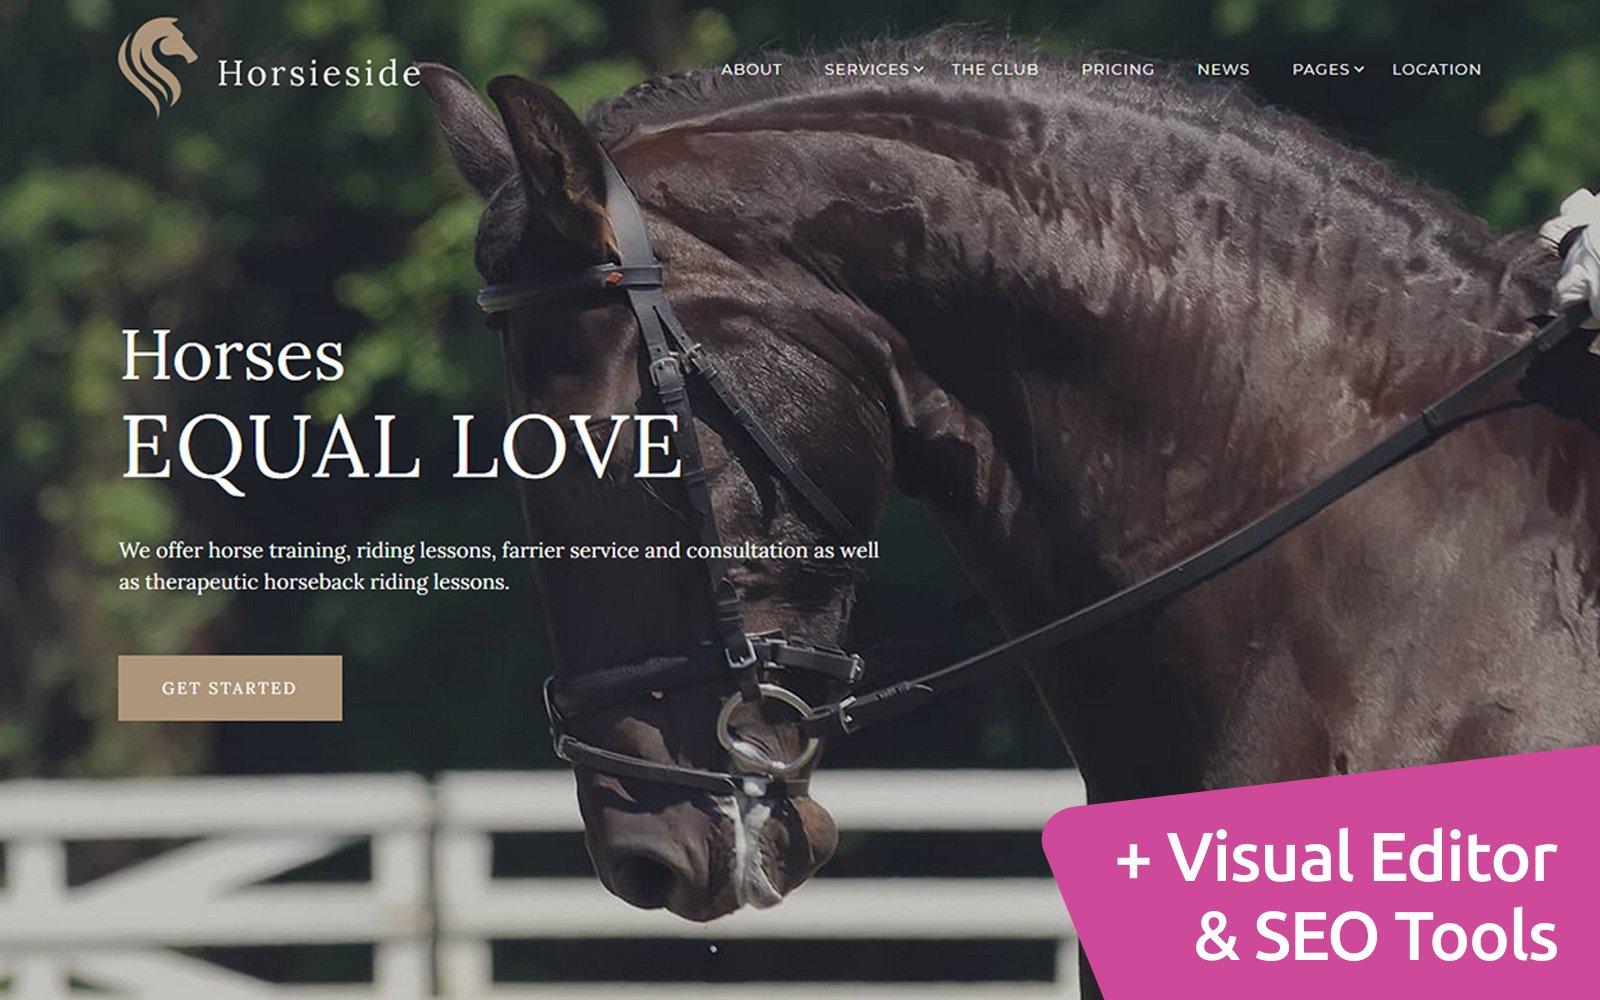 Reszponzív Horsieside - Equestrian Center Moto CMS 3 sablon 118084